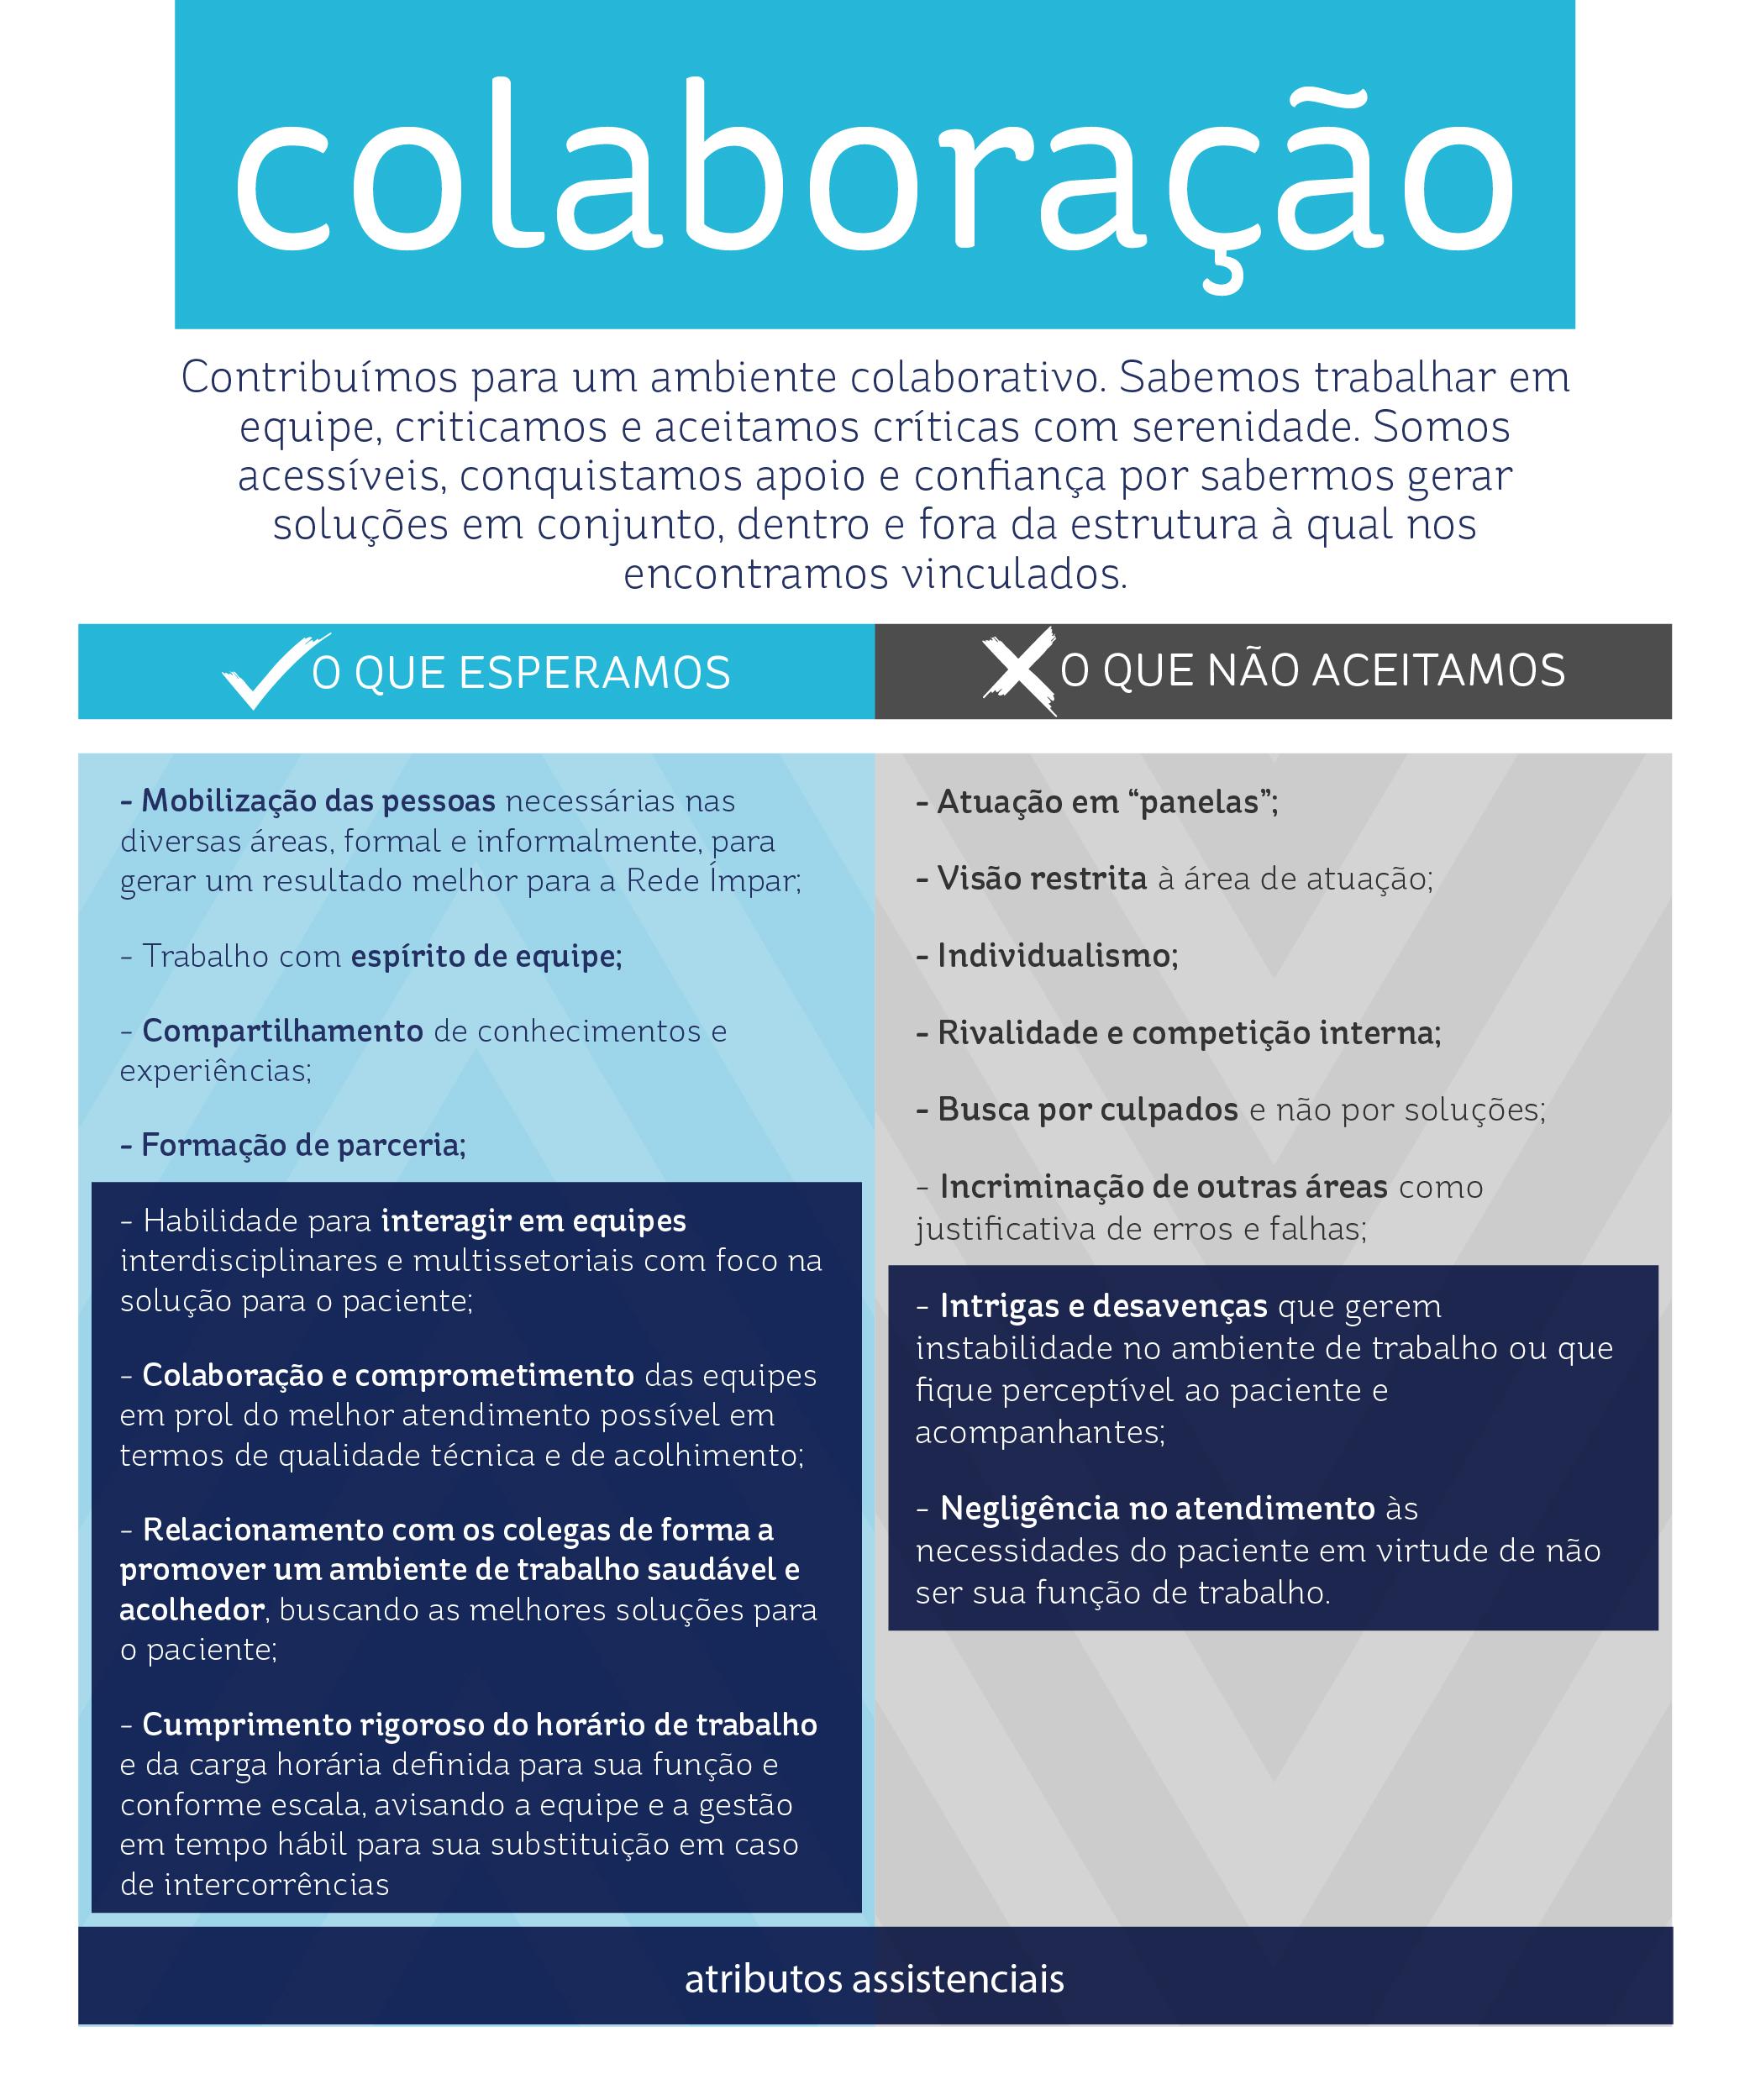 colaboracao_redeimpar